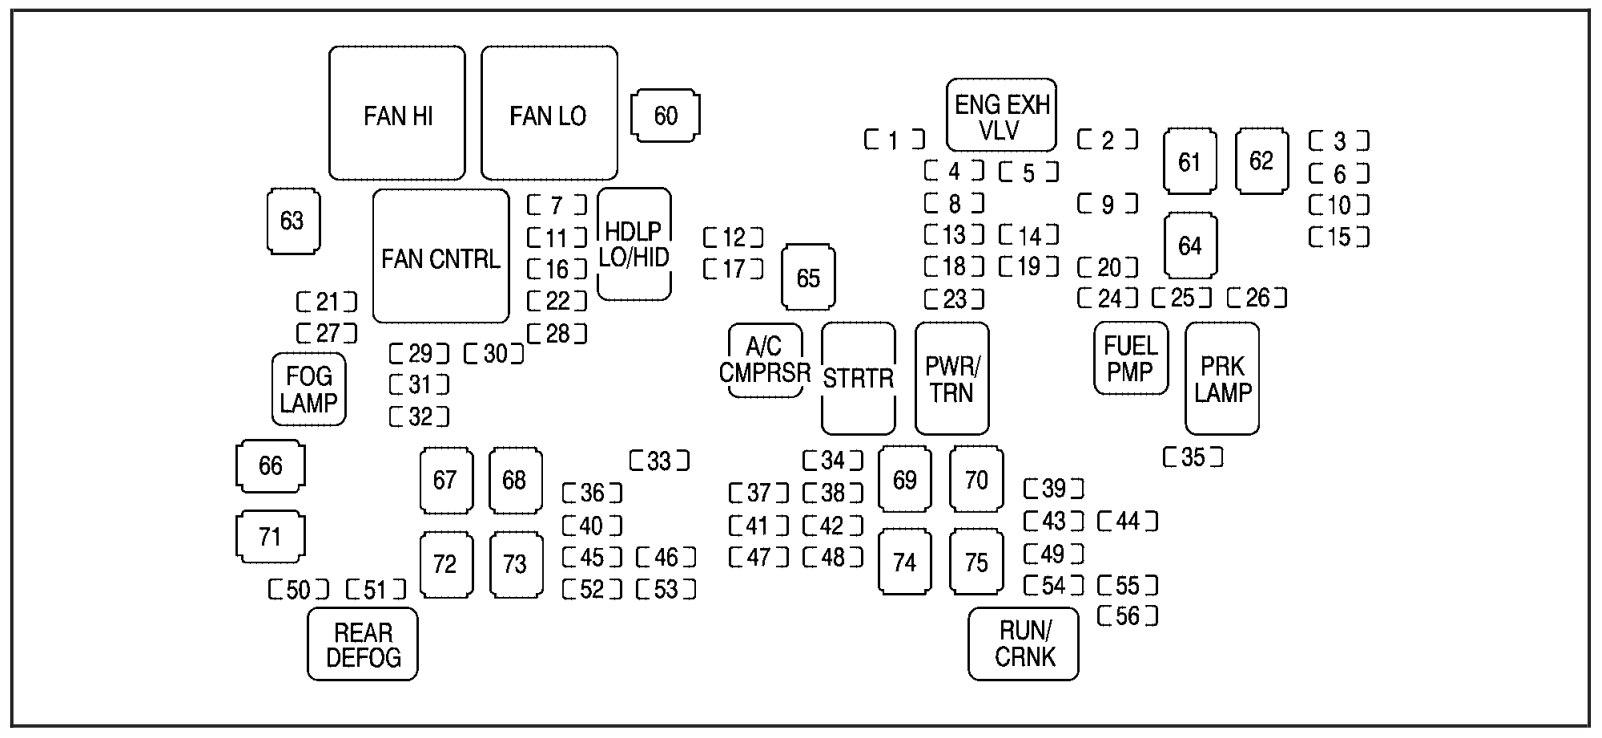 96 Tahoe Fuse Diagram - Fs R9b Wiring Diagrams for Wiring Diagram SchematicsWiring Diagram Schematics